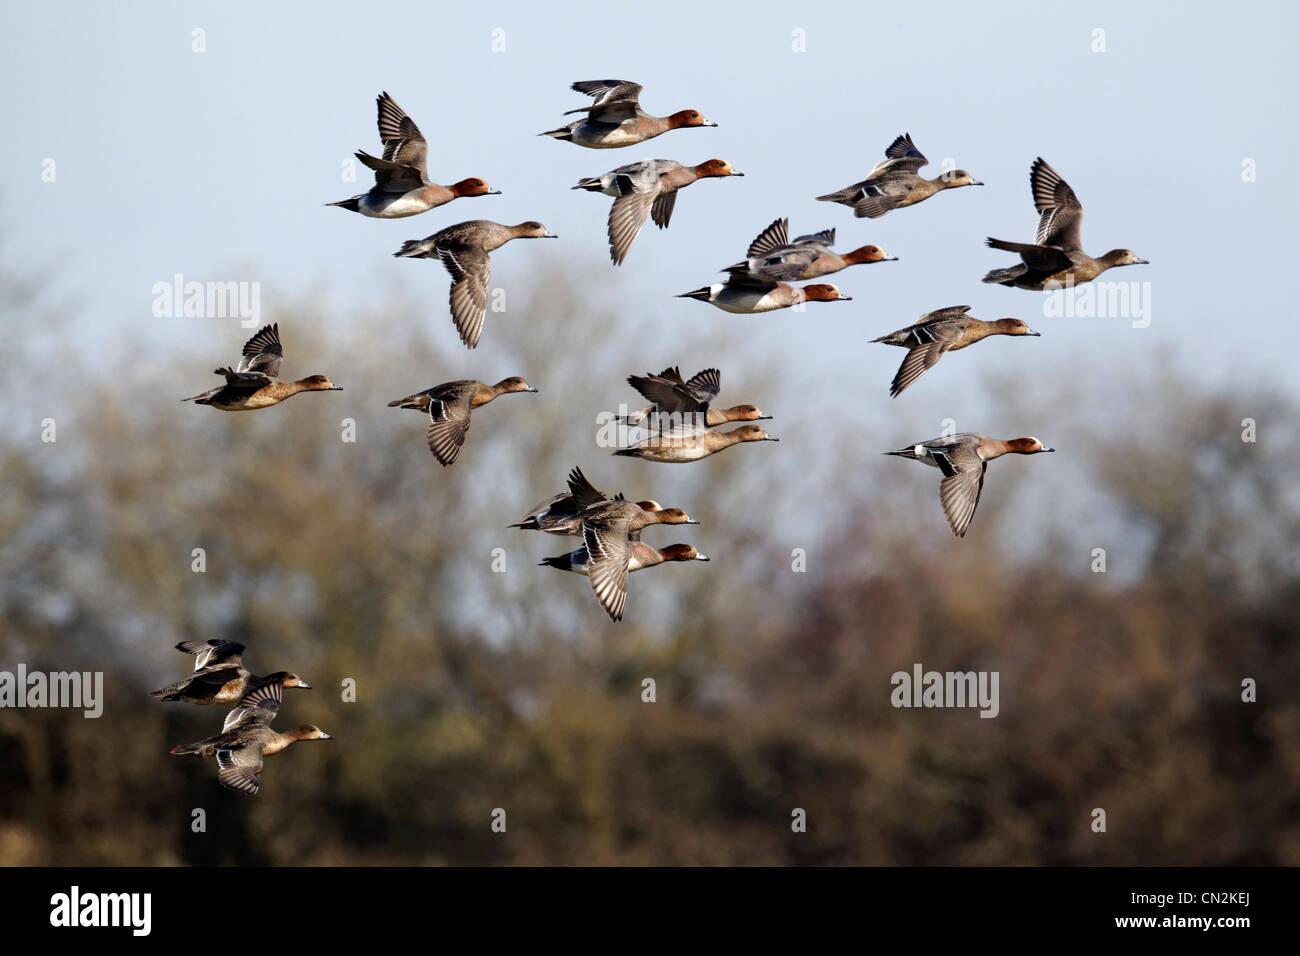 Wigeon, Anas penelope, gruppo di uccelli in volo, Gloucestershire, Marzo 2012 Immagini Stock